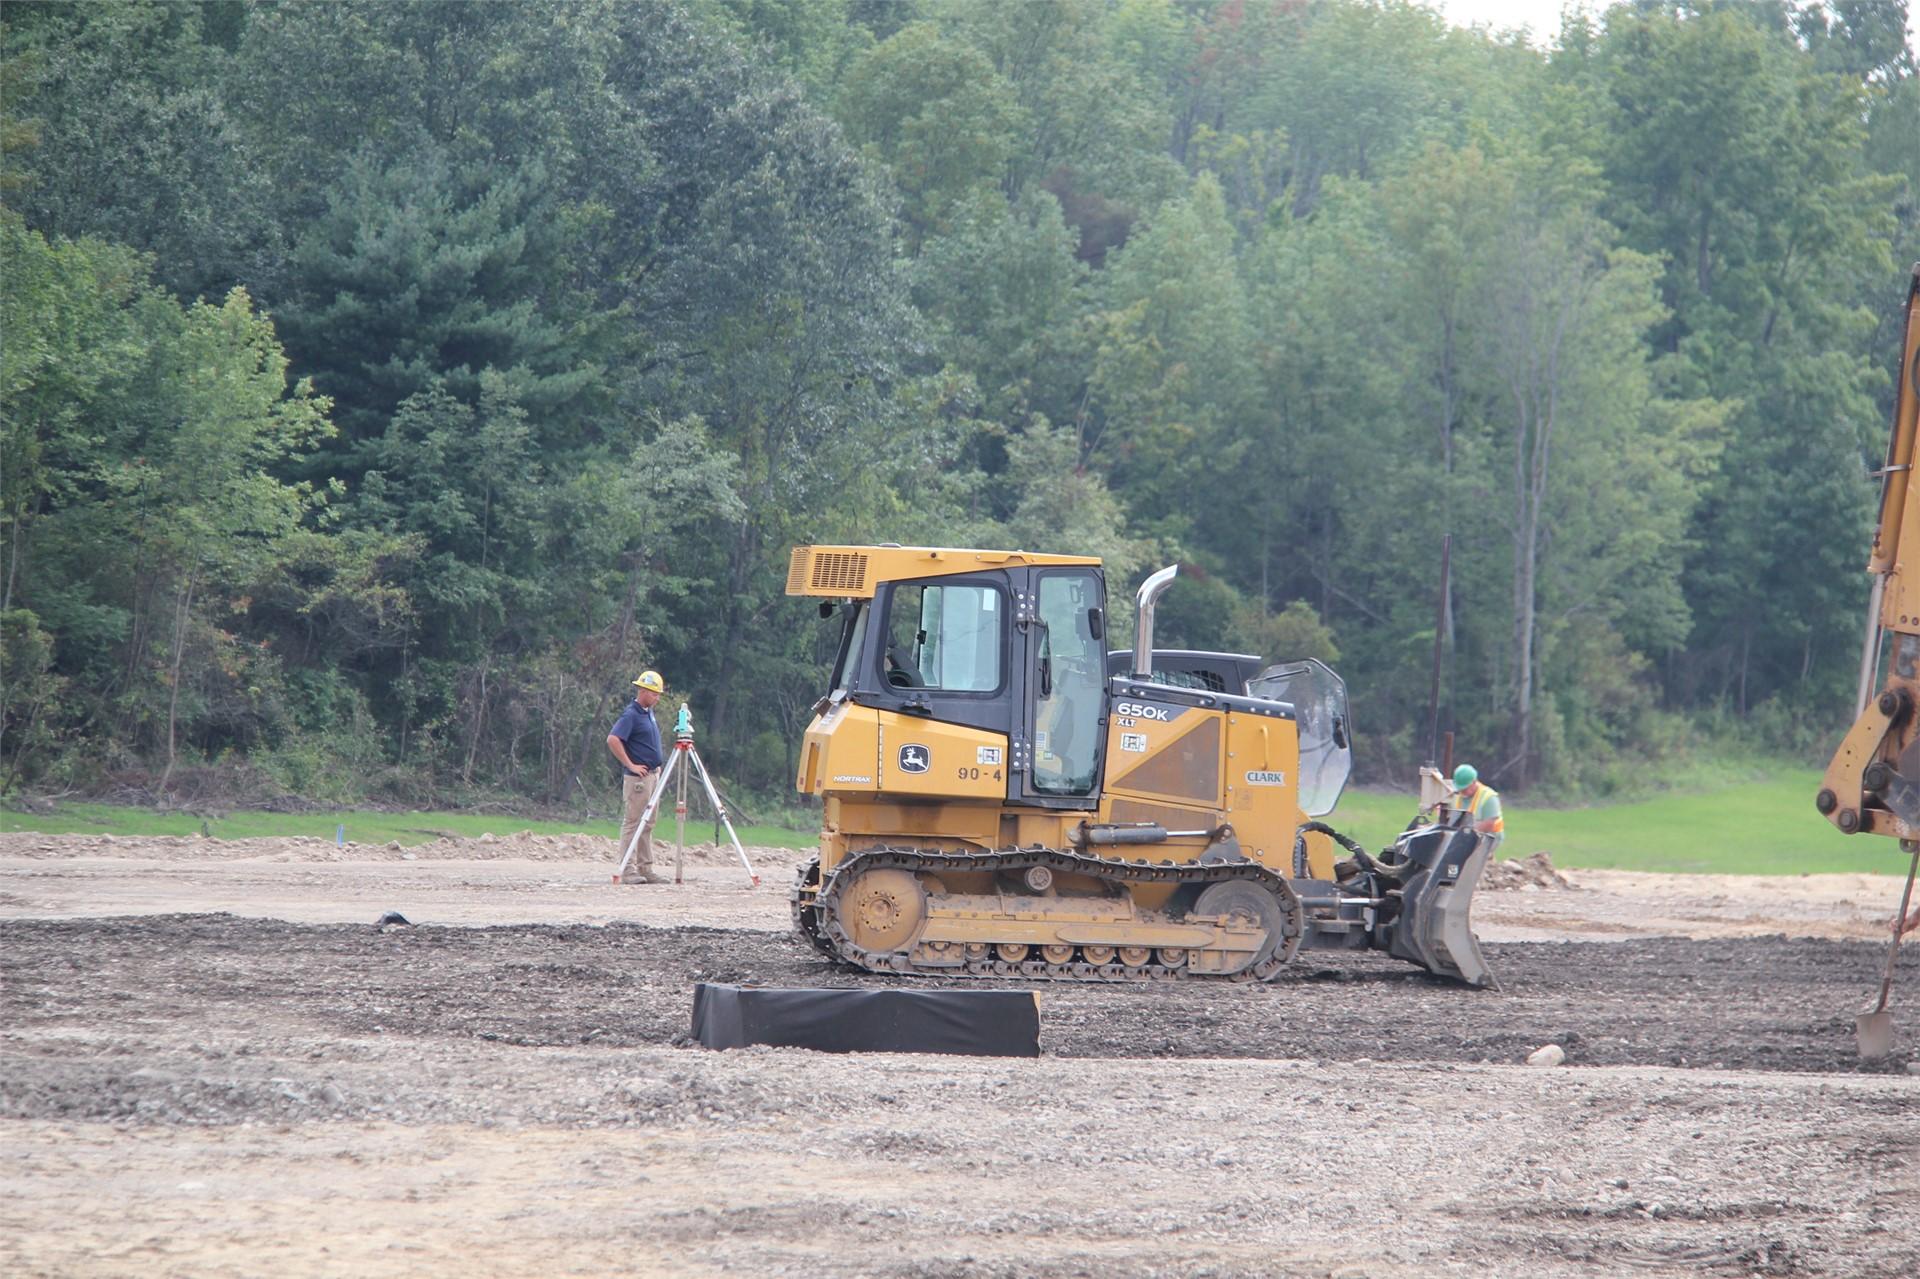 medium shot of equipment working on construction outside